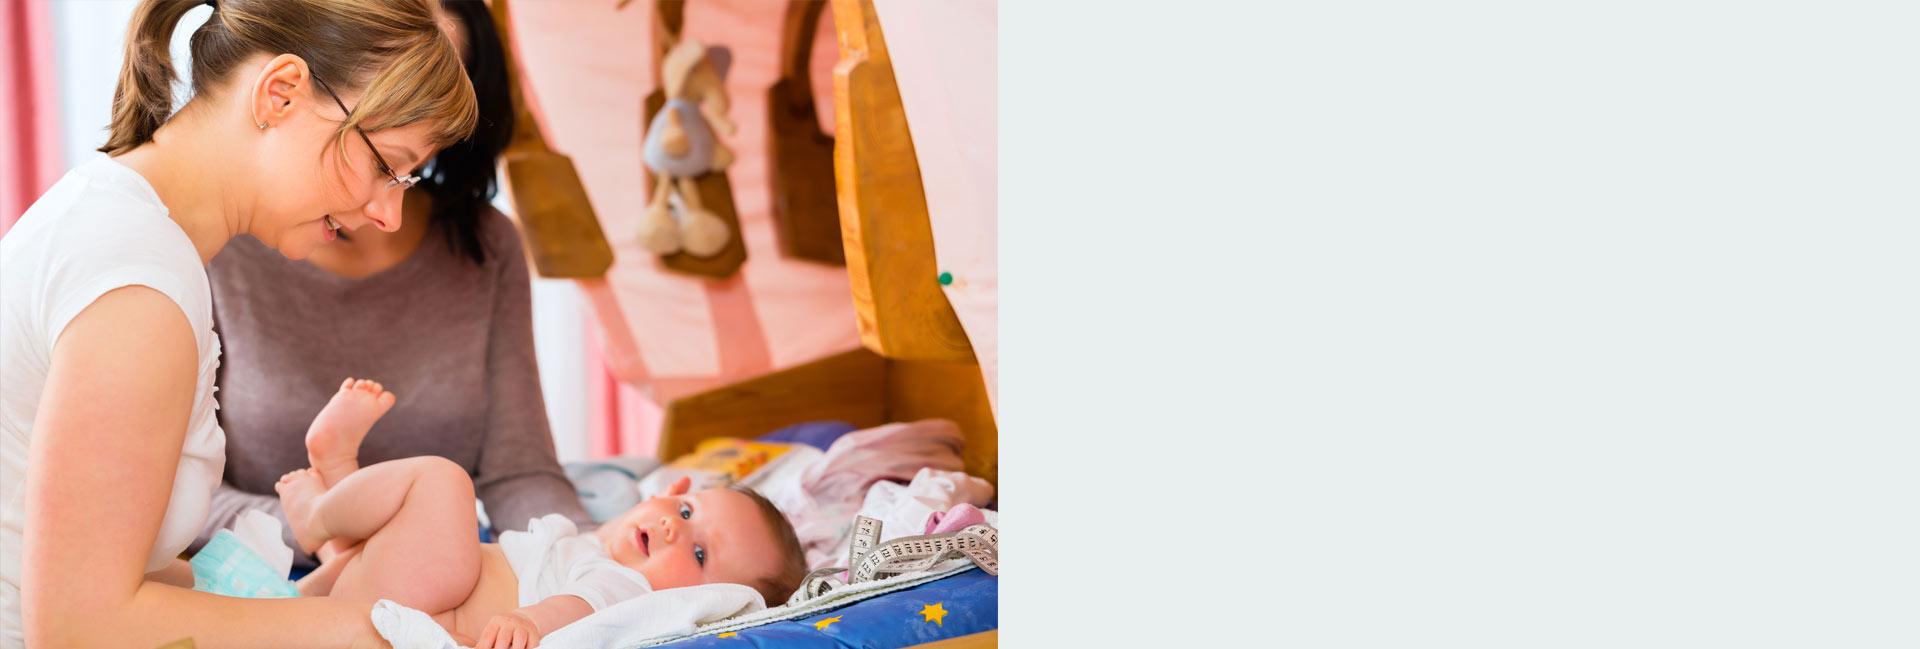 Midwifery New